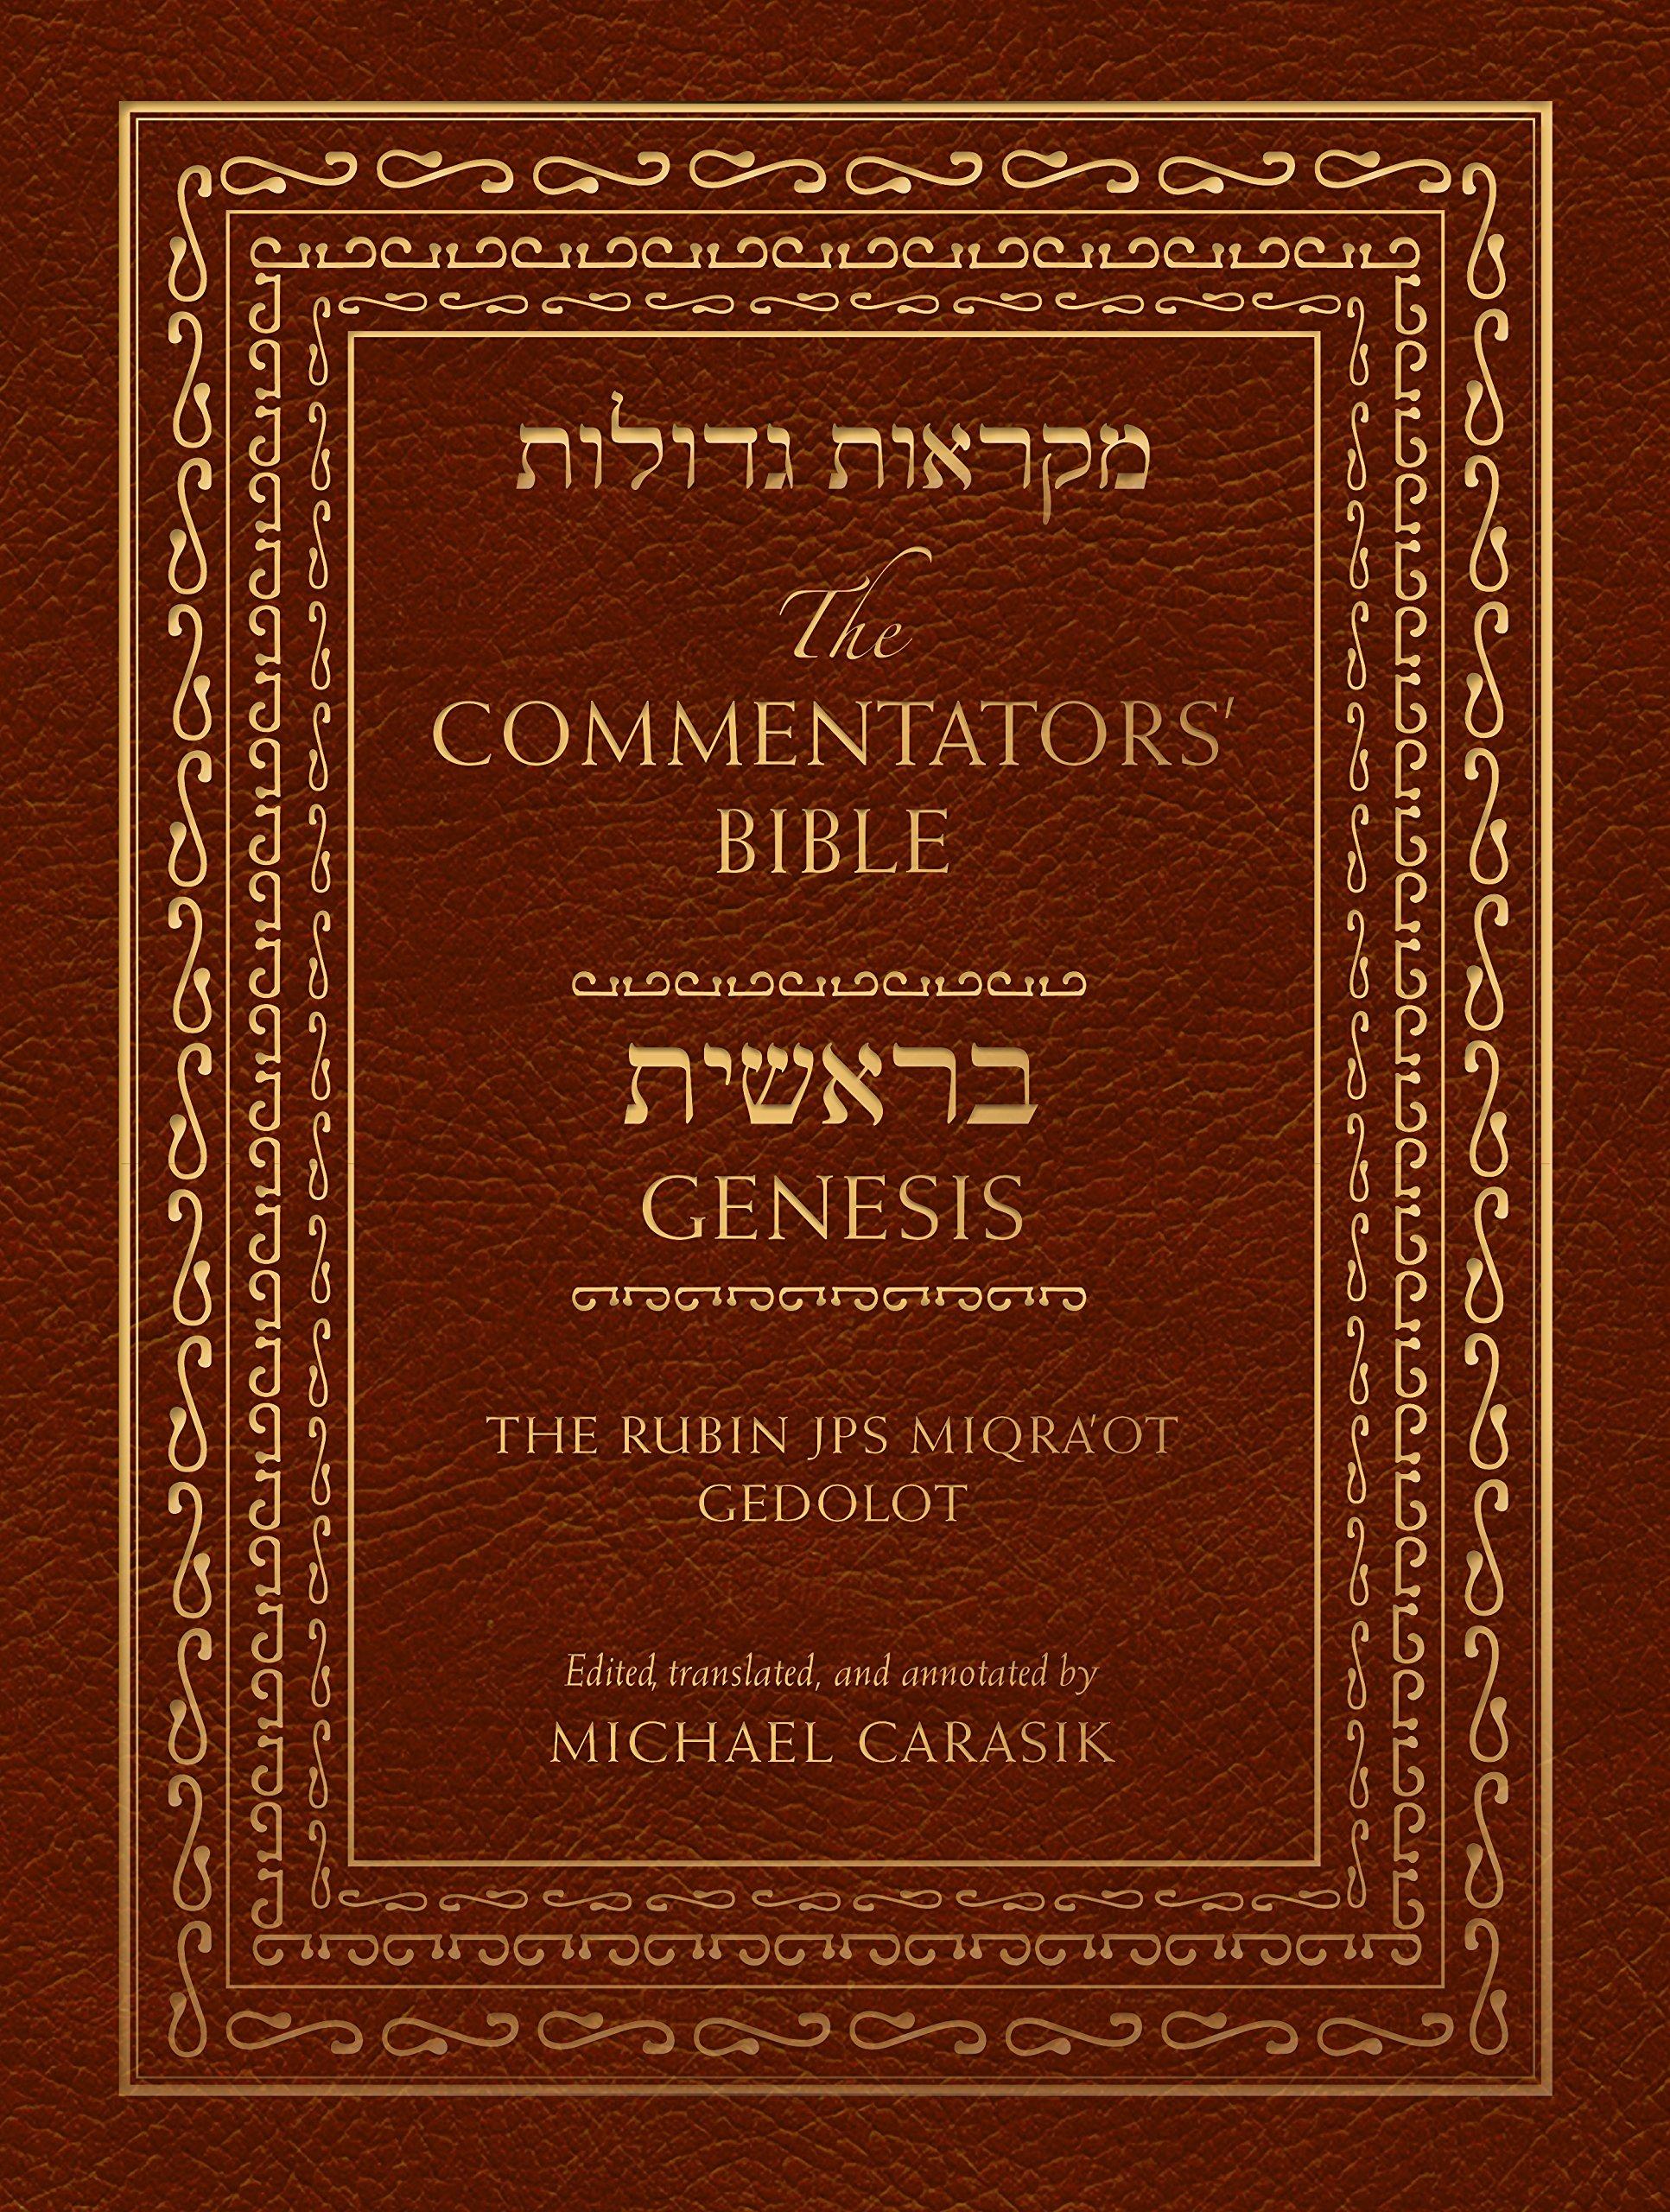 The Commentators' Bible  Genesis